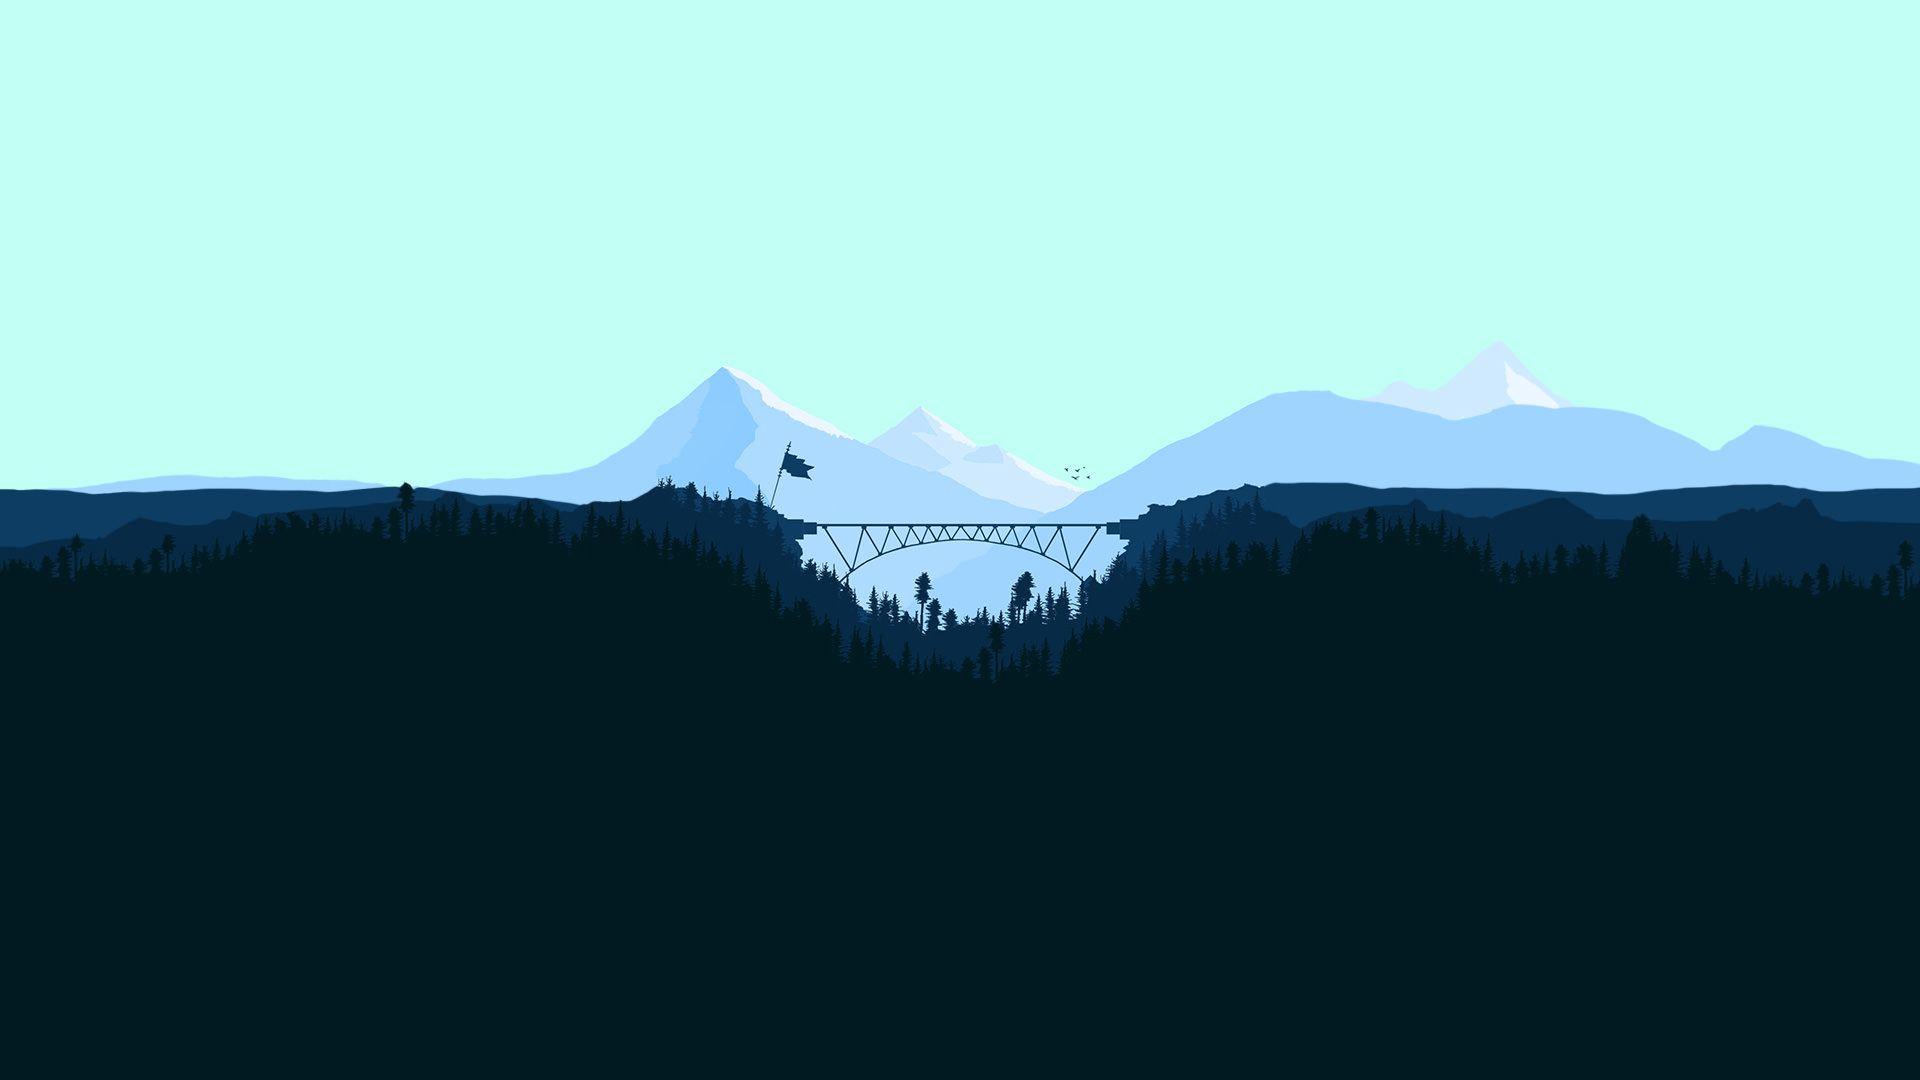 Minimalist Bridge Between Mountains 1920x1080 Hd Wallpaper Wallpaper Desktop Wallpaper